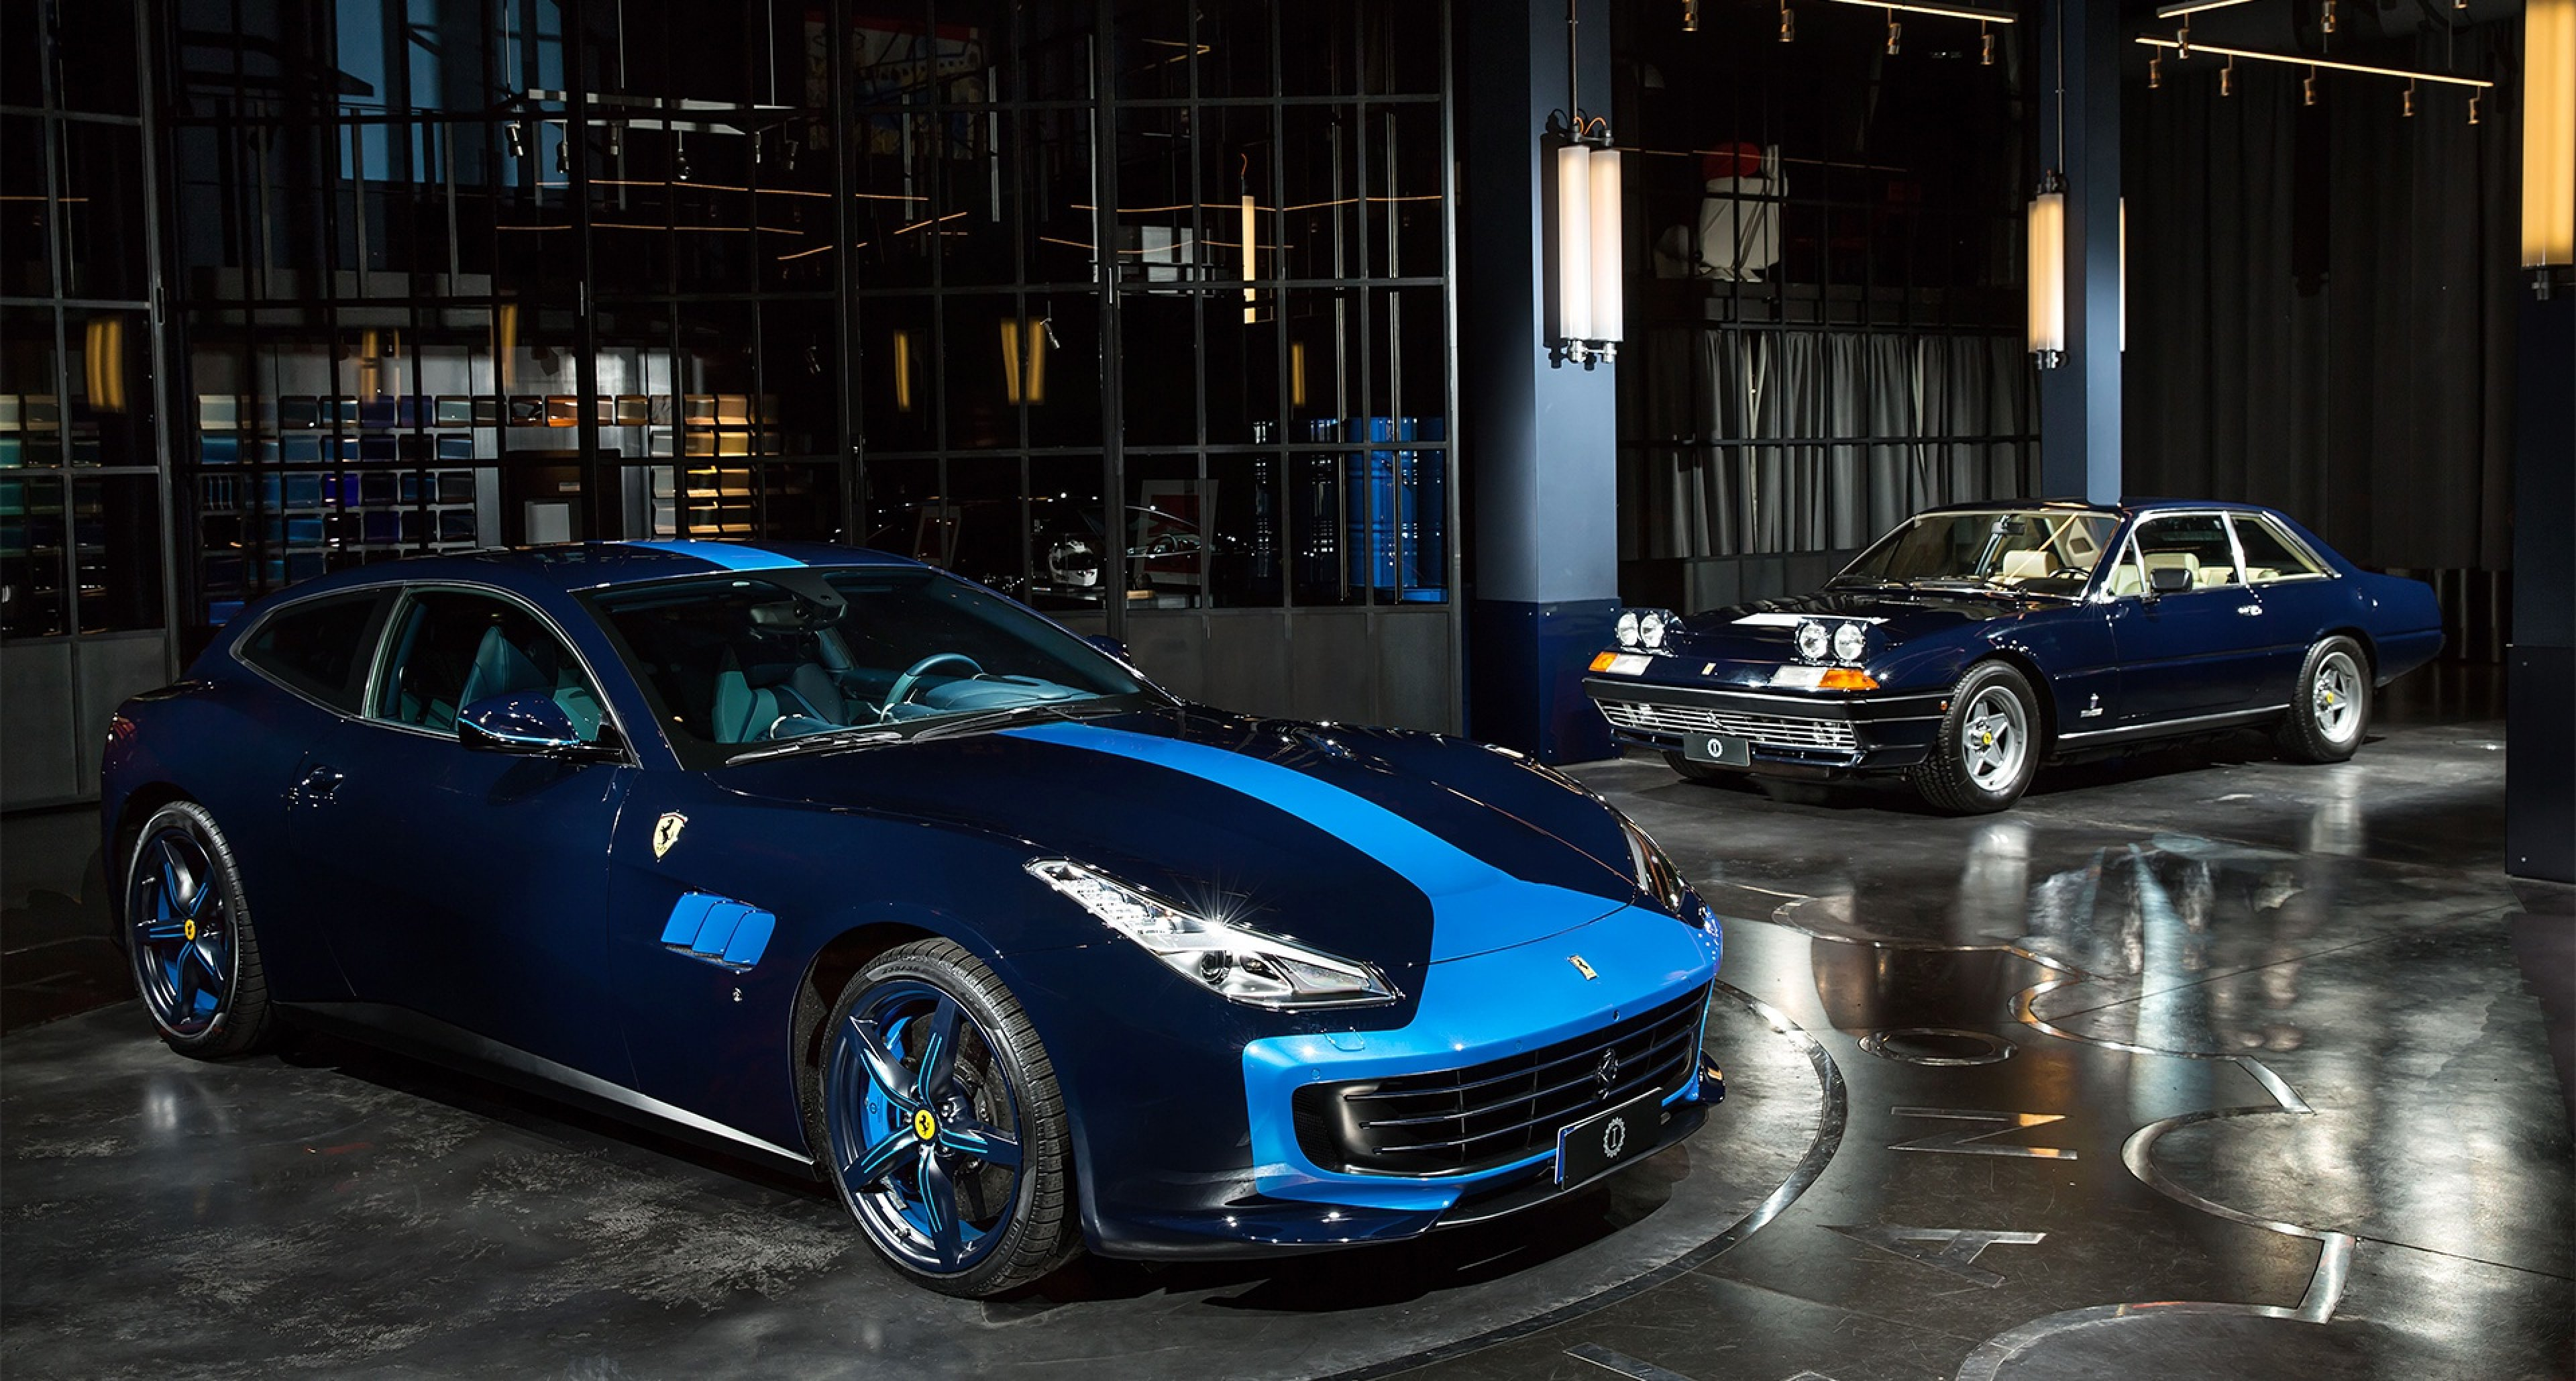 Garage Italia Customs Ferrari Gtc4 Lusso Ist Ein Blaues Wunder Classic Driver Magazine